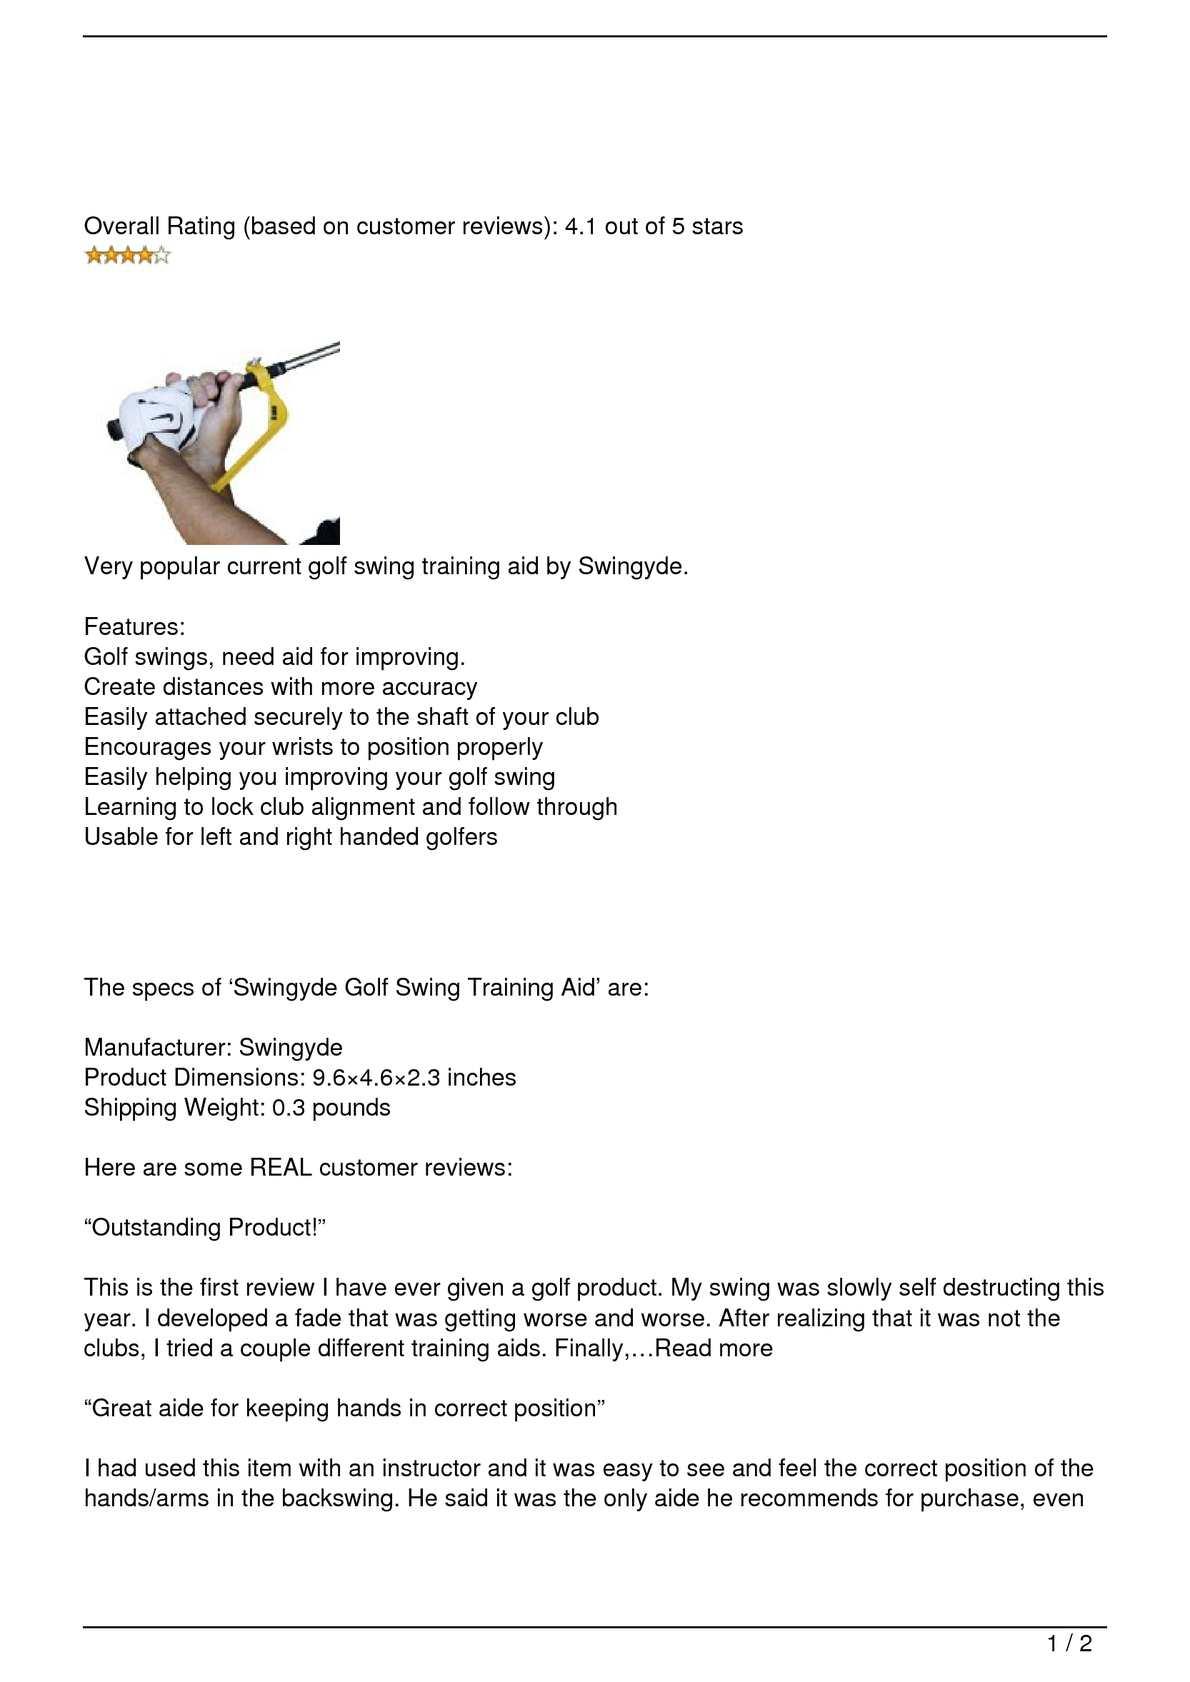 Calameo Swingyde Golf Swing Training Aid